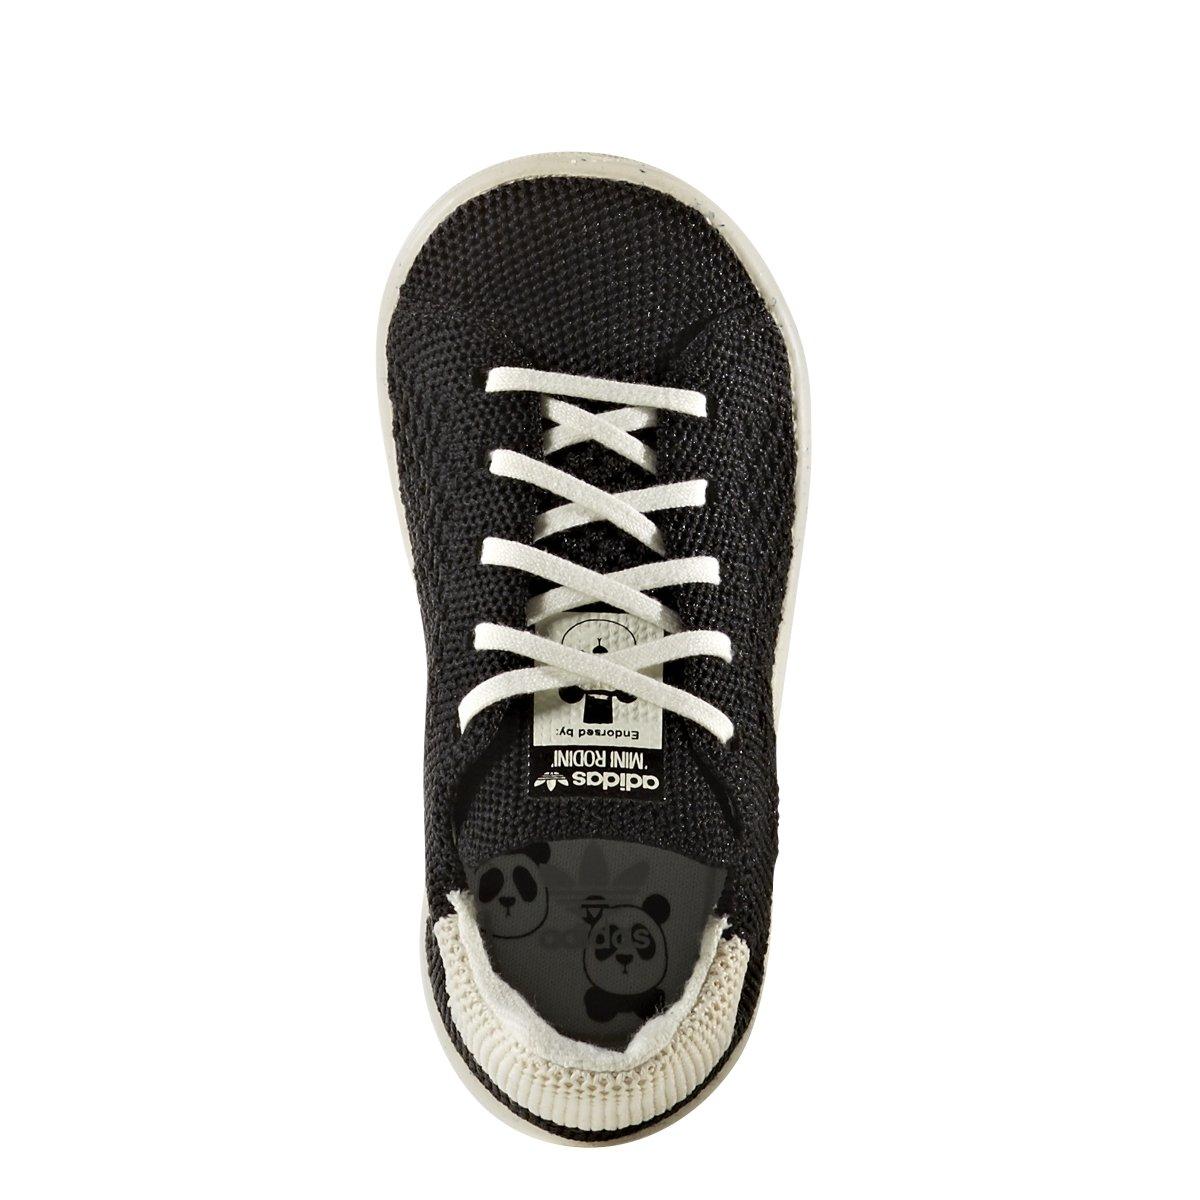 adidas door Mini Rodini Stan Smith PK Mr I Core   adidas by Mini Rodini Stan Smith PK Mr I Core  f70a7299370ce867c5dd2f4a82c1f4c2     adidas by Mini Rodini Stan Smith PK Mr I Core